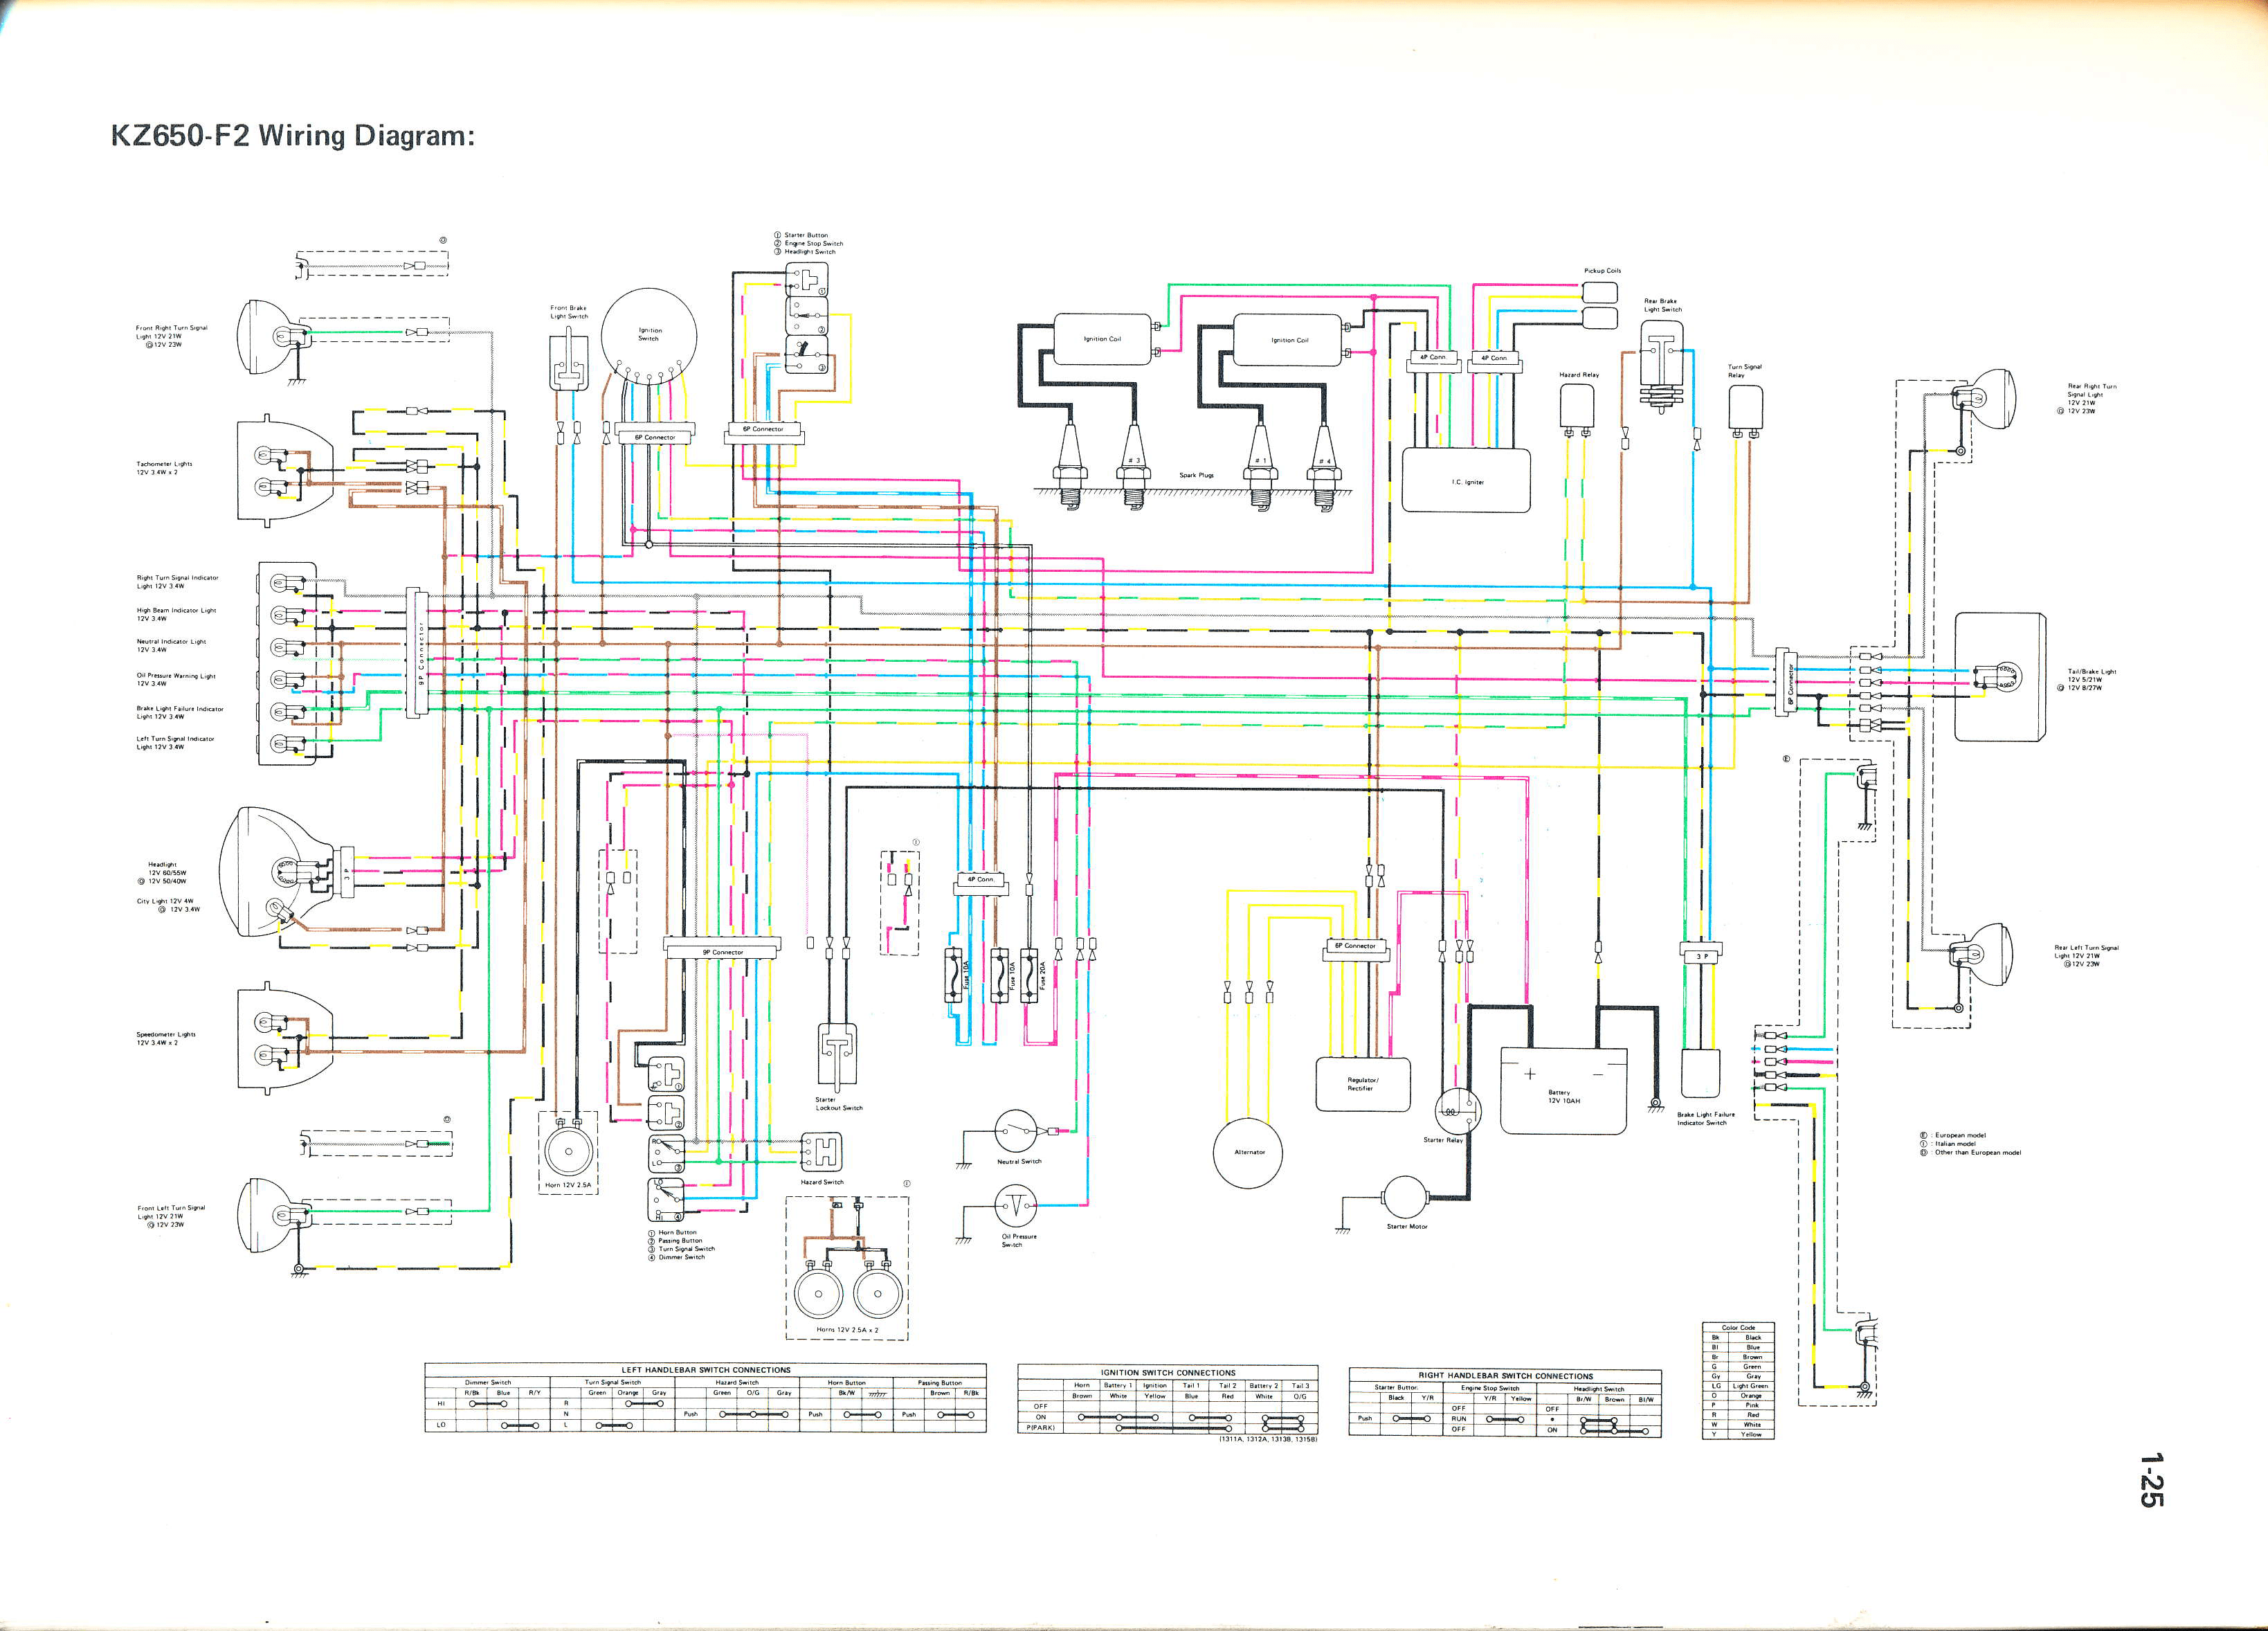 OEM Service Manual KZ650 F2?resize\\\=665%2C478 2001 honda 400ex wiring diagram tamahuproject org honda 400ex wiring schematic at gsmx.co